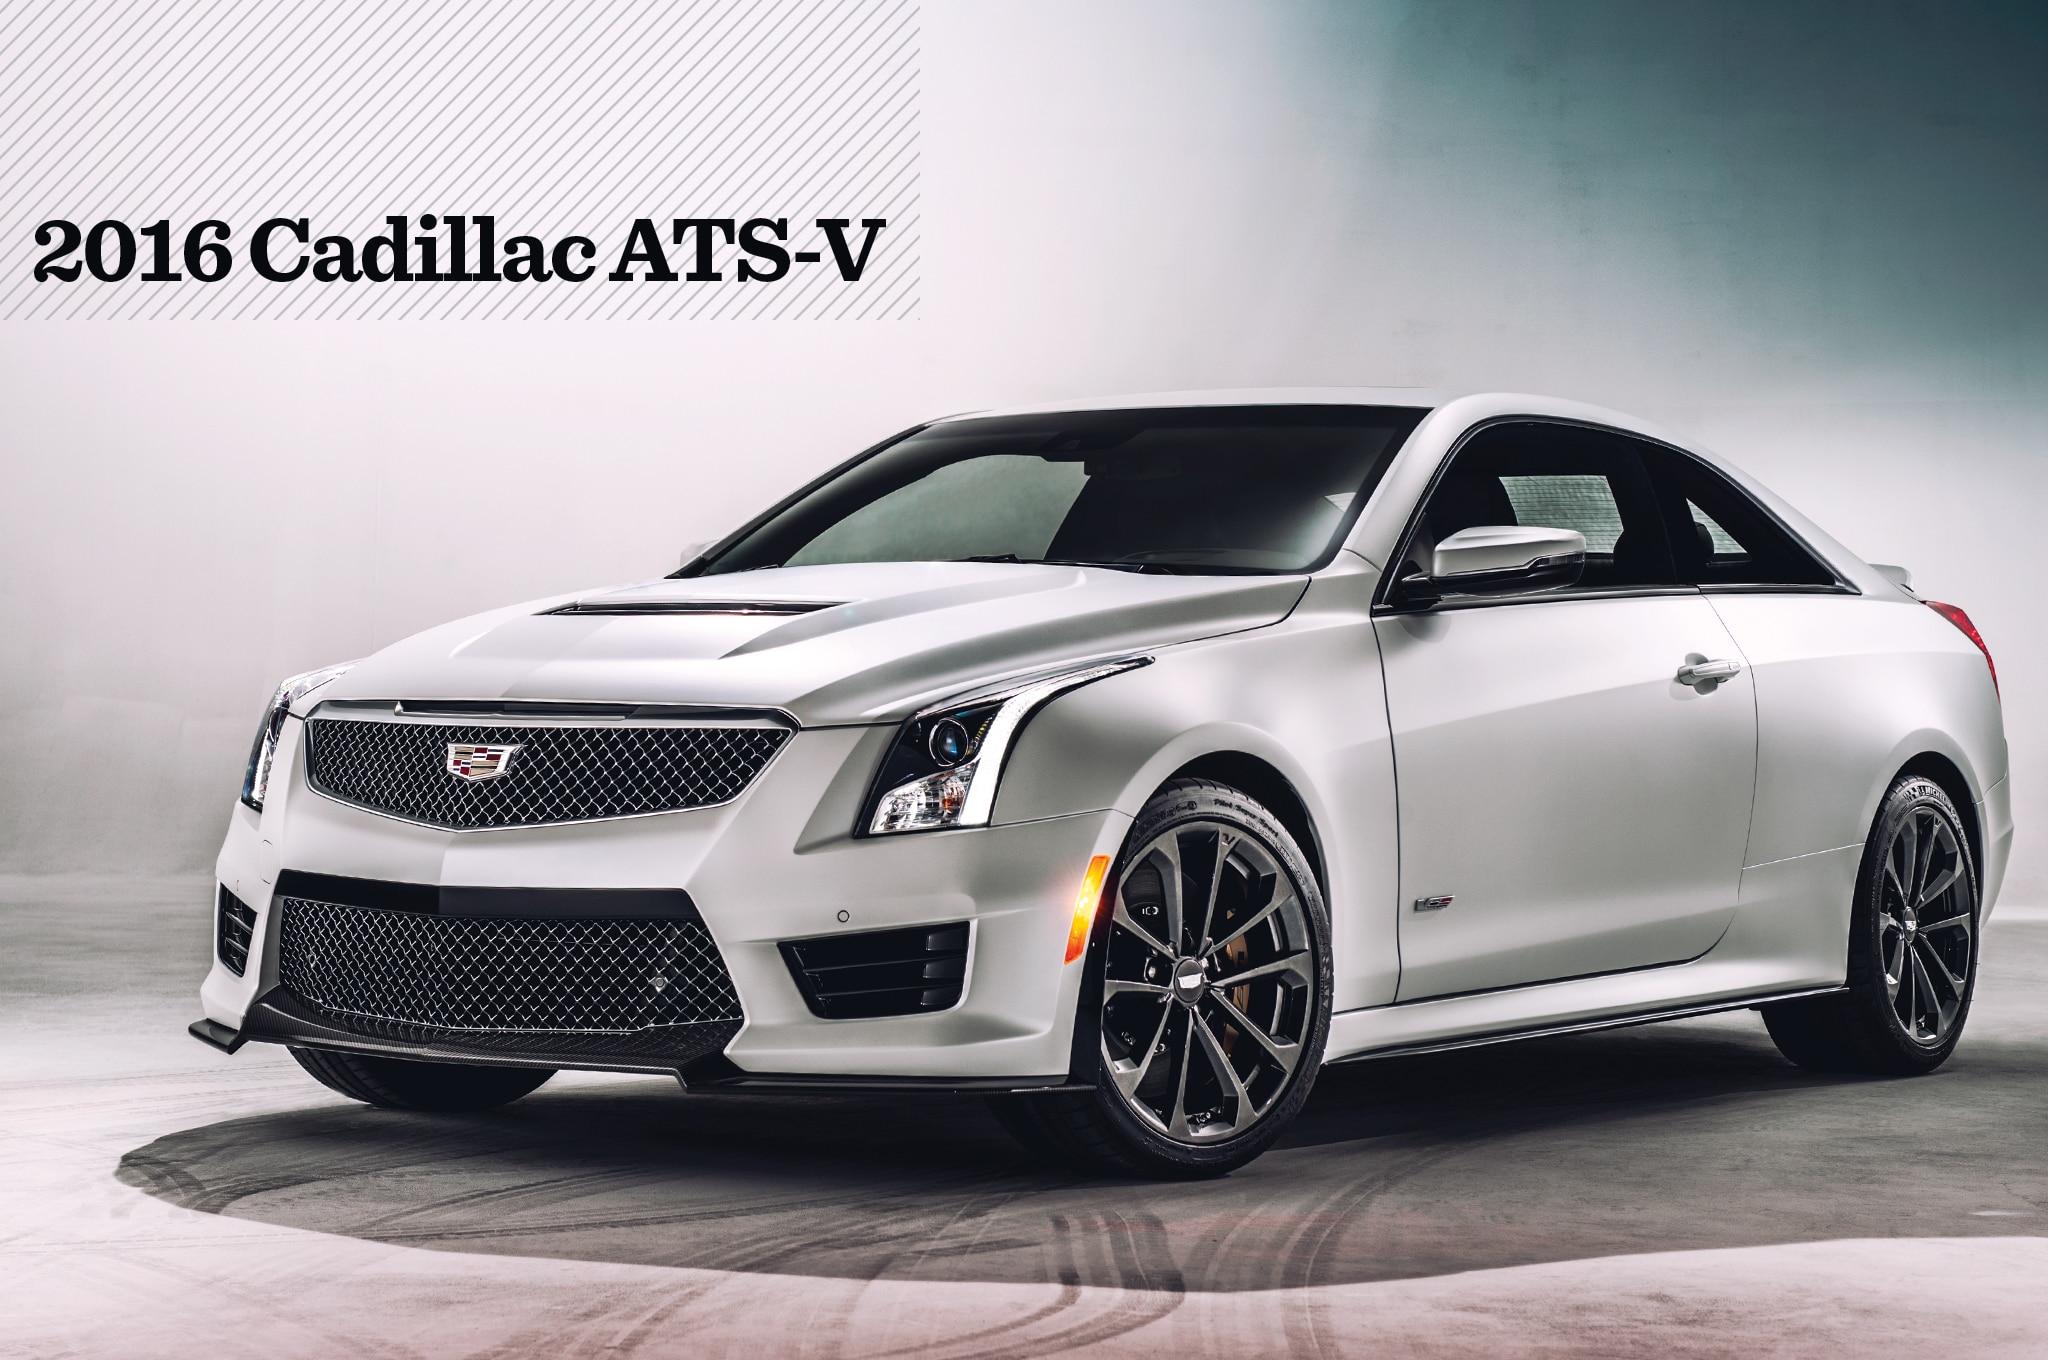 2016 Cadillac ATS V Outmuscling the M3